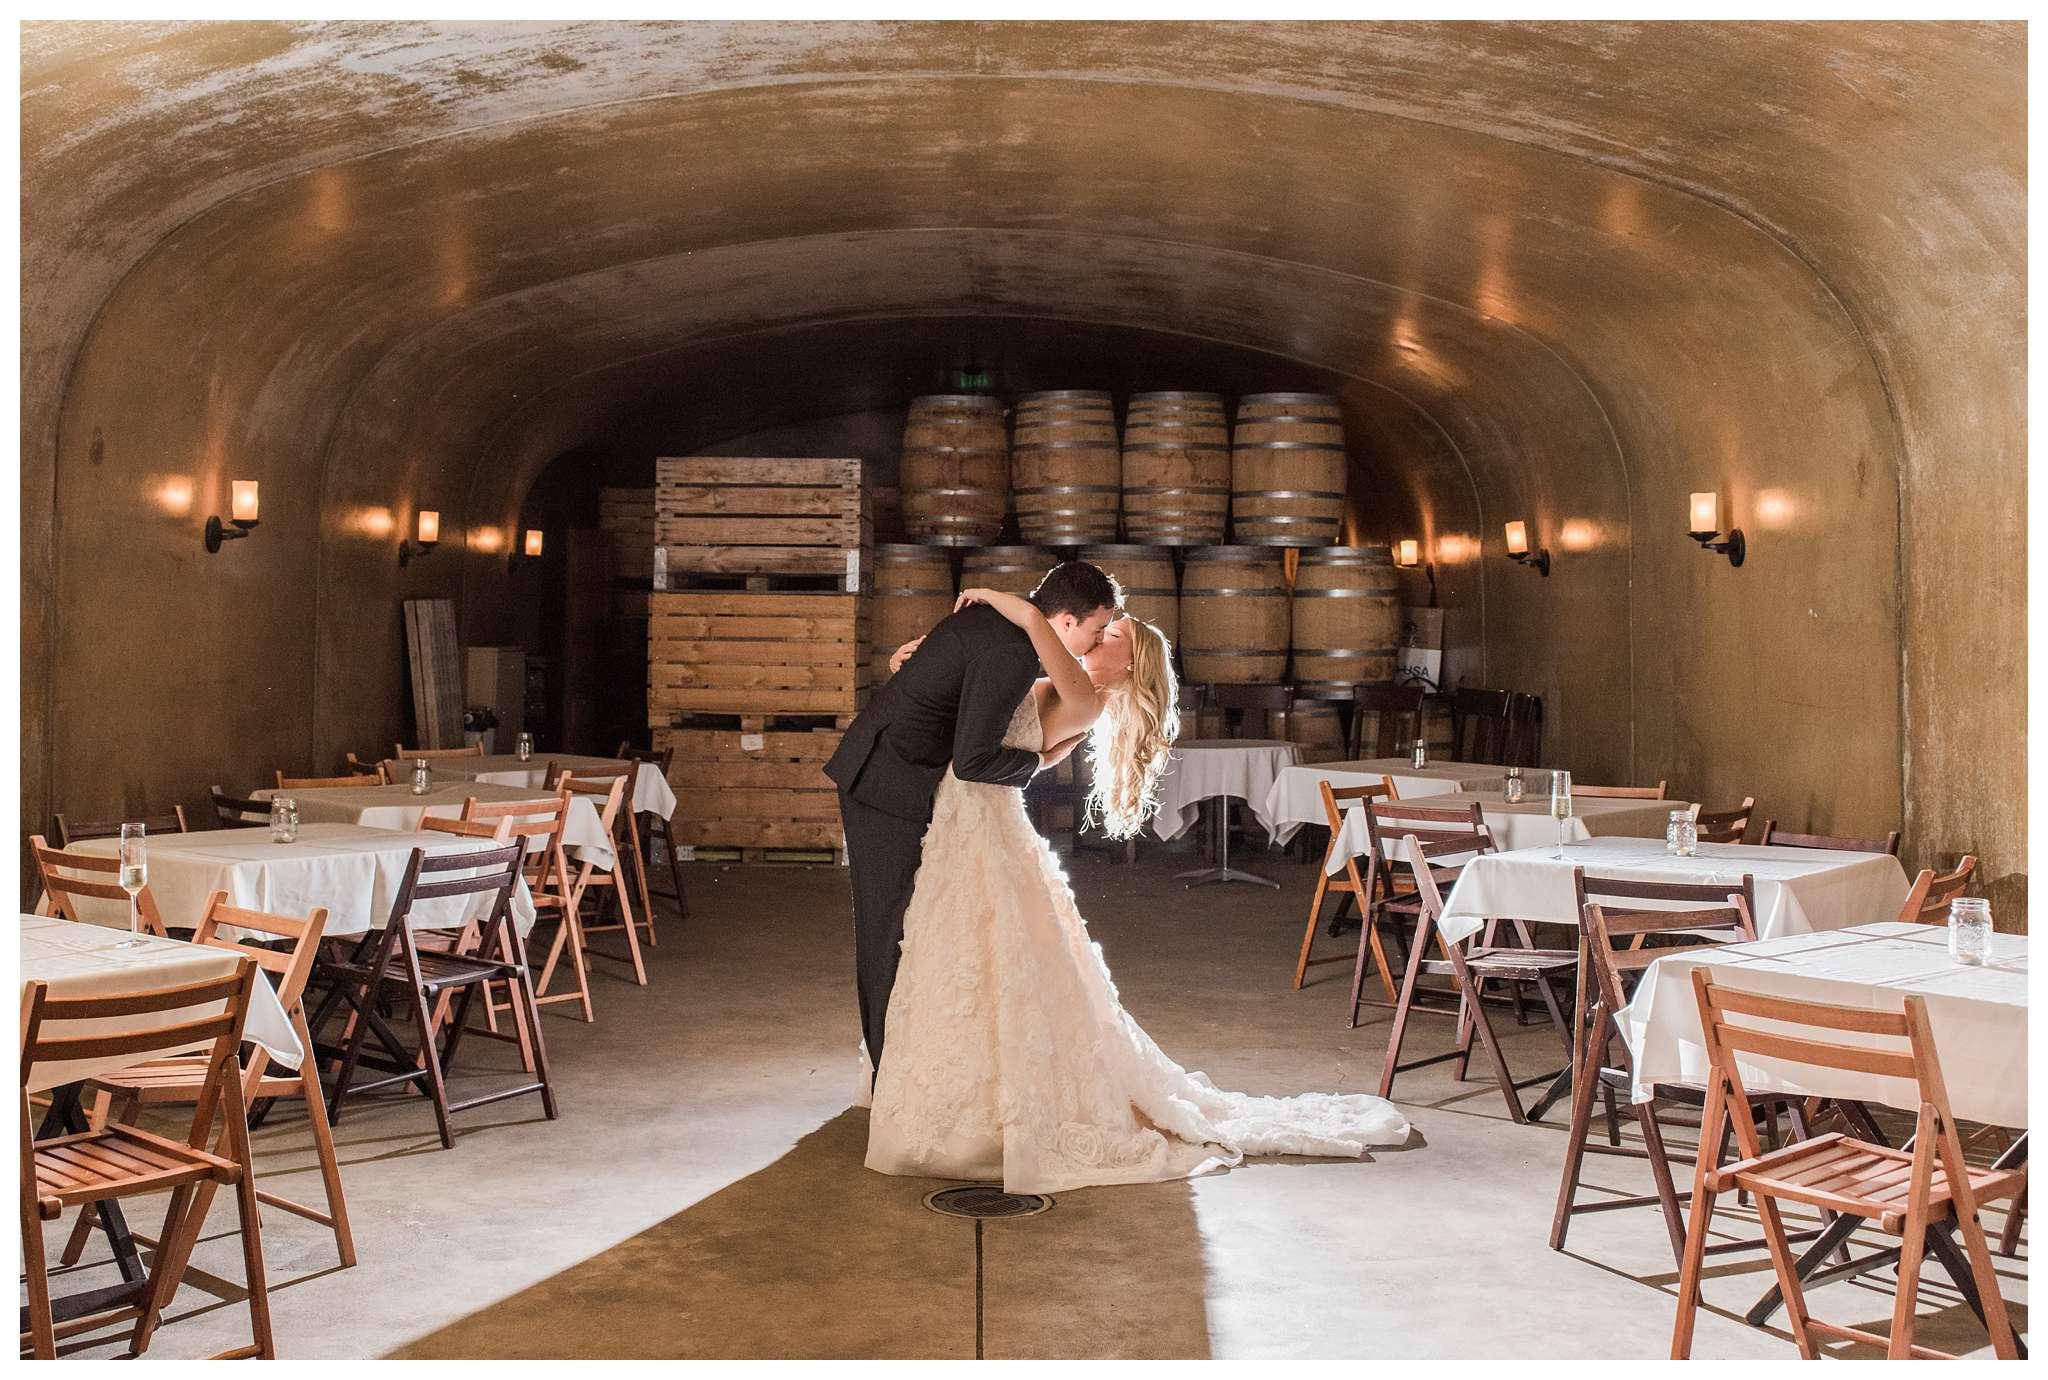 Mr. & Mrs. Running - Karma Vineyards